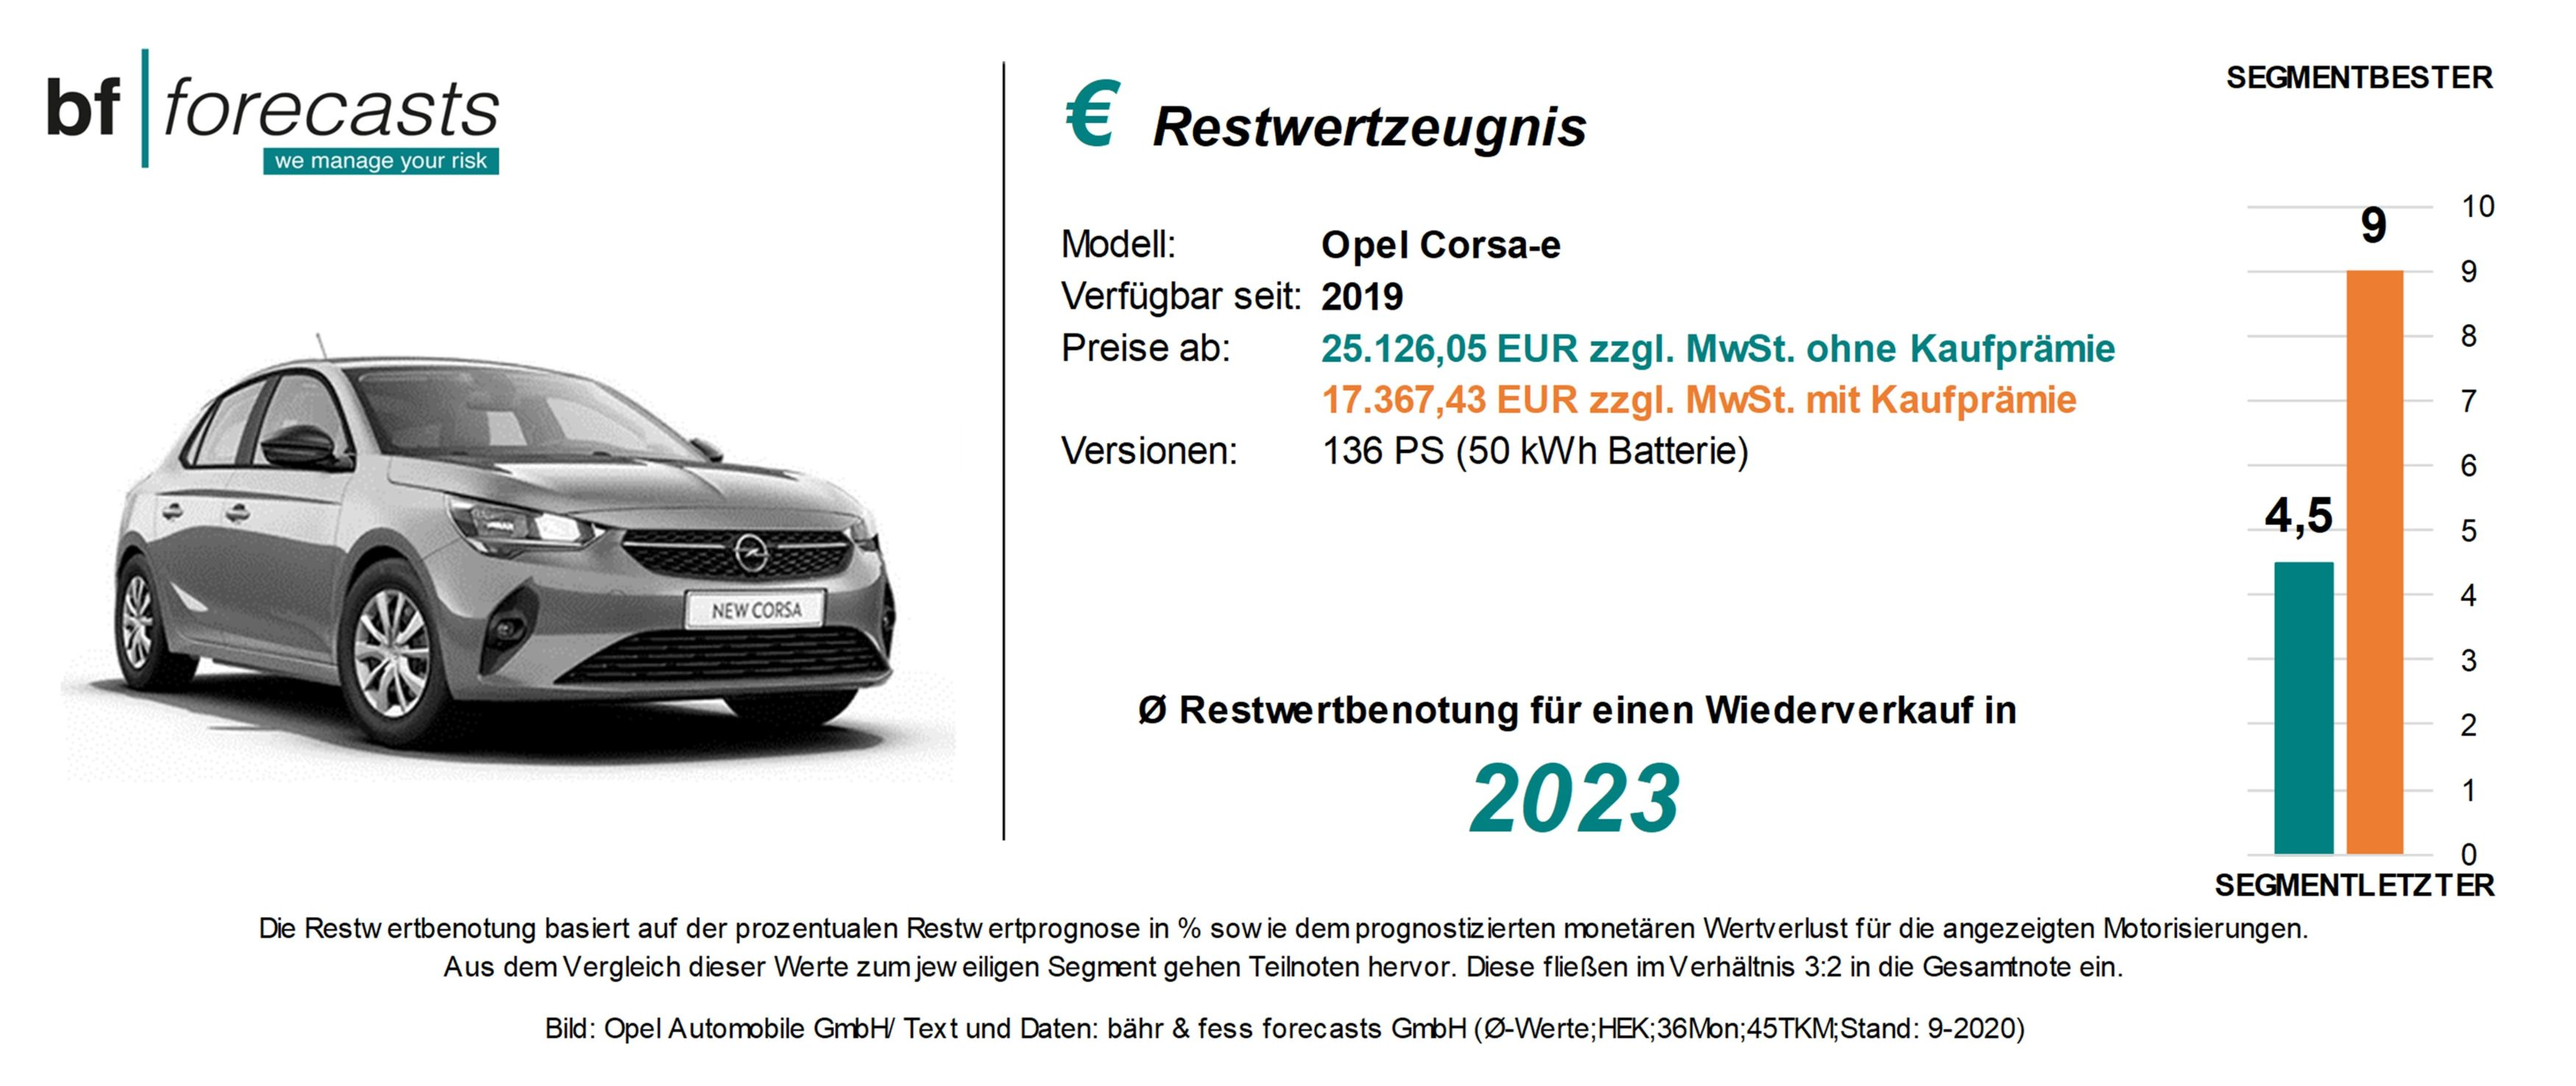 Restwertzeugnis Opel Corsa-e